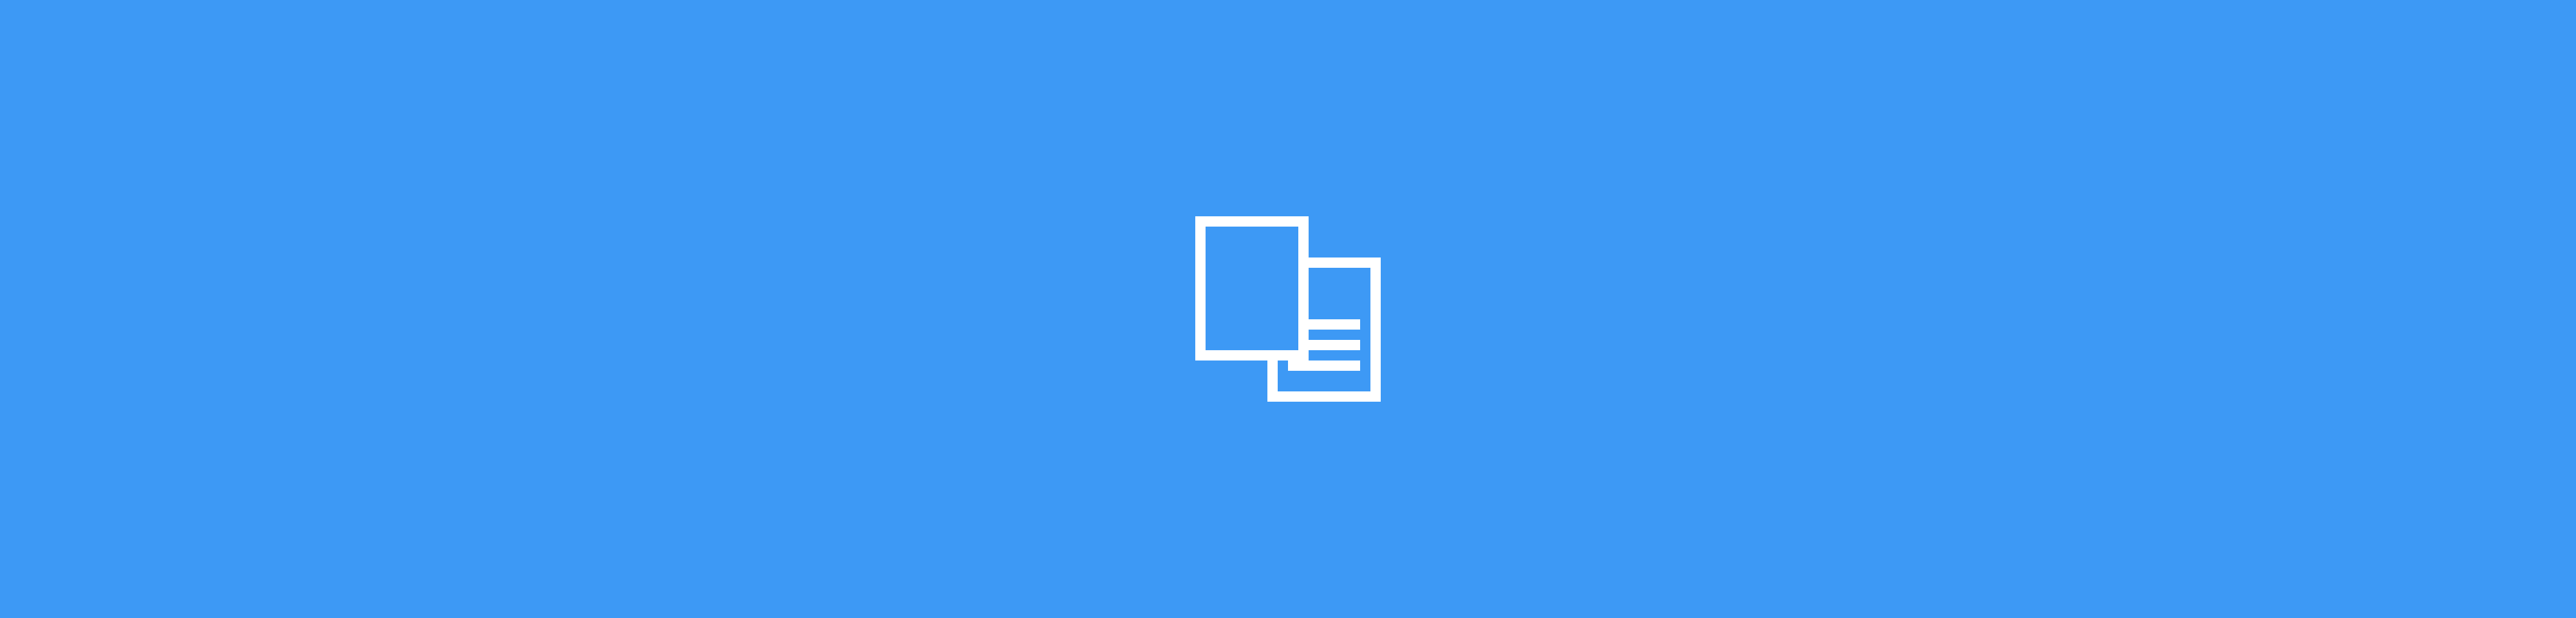 convertir word a jpg online free